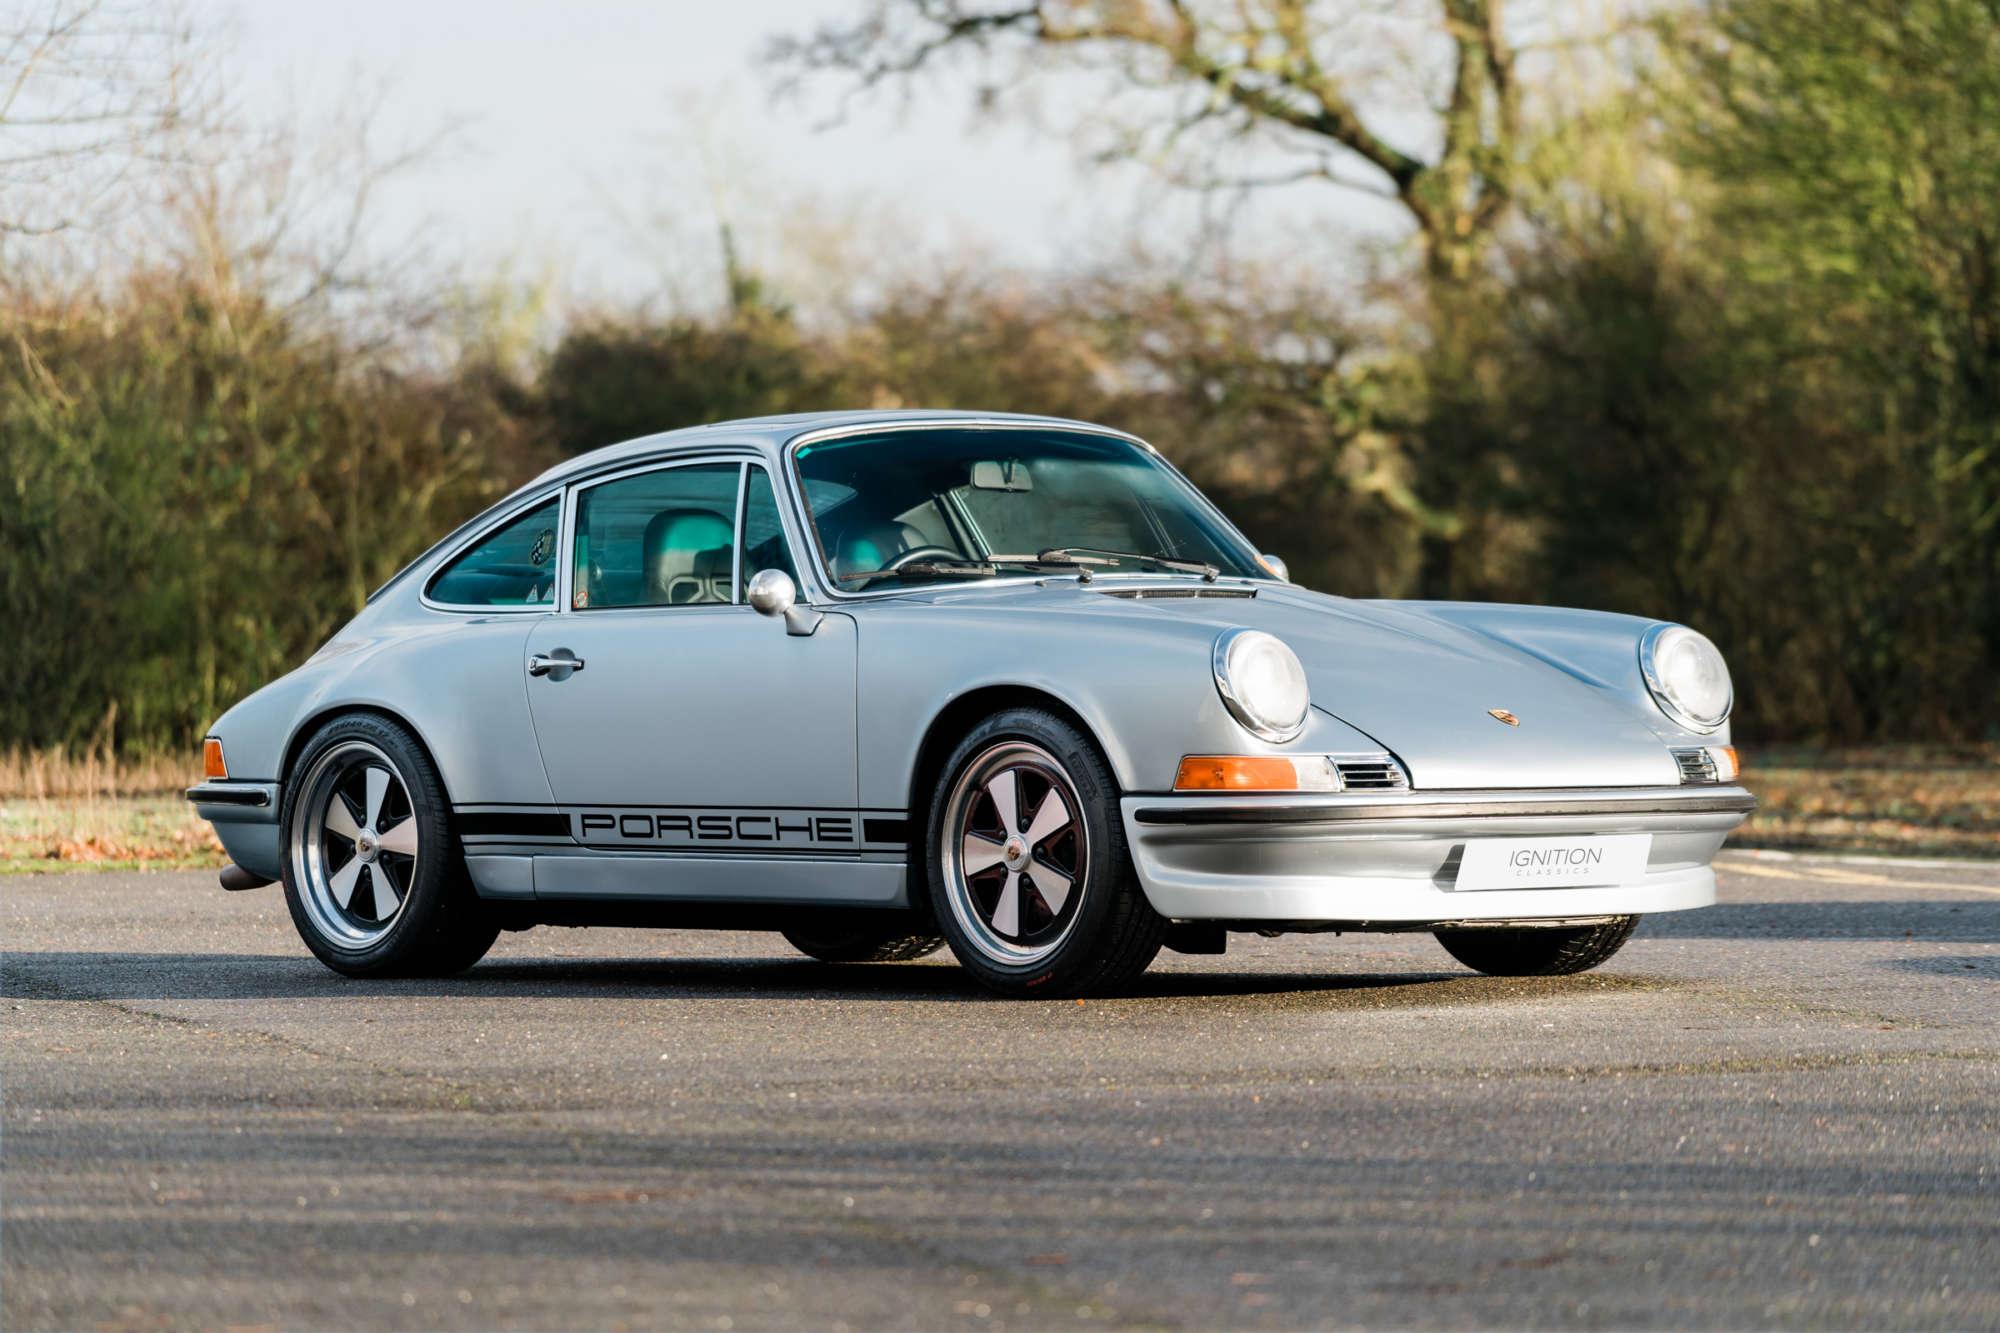 Porsche Paul Stephens Autoart Retro Touring R